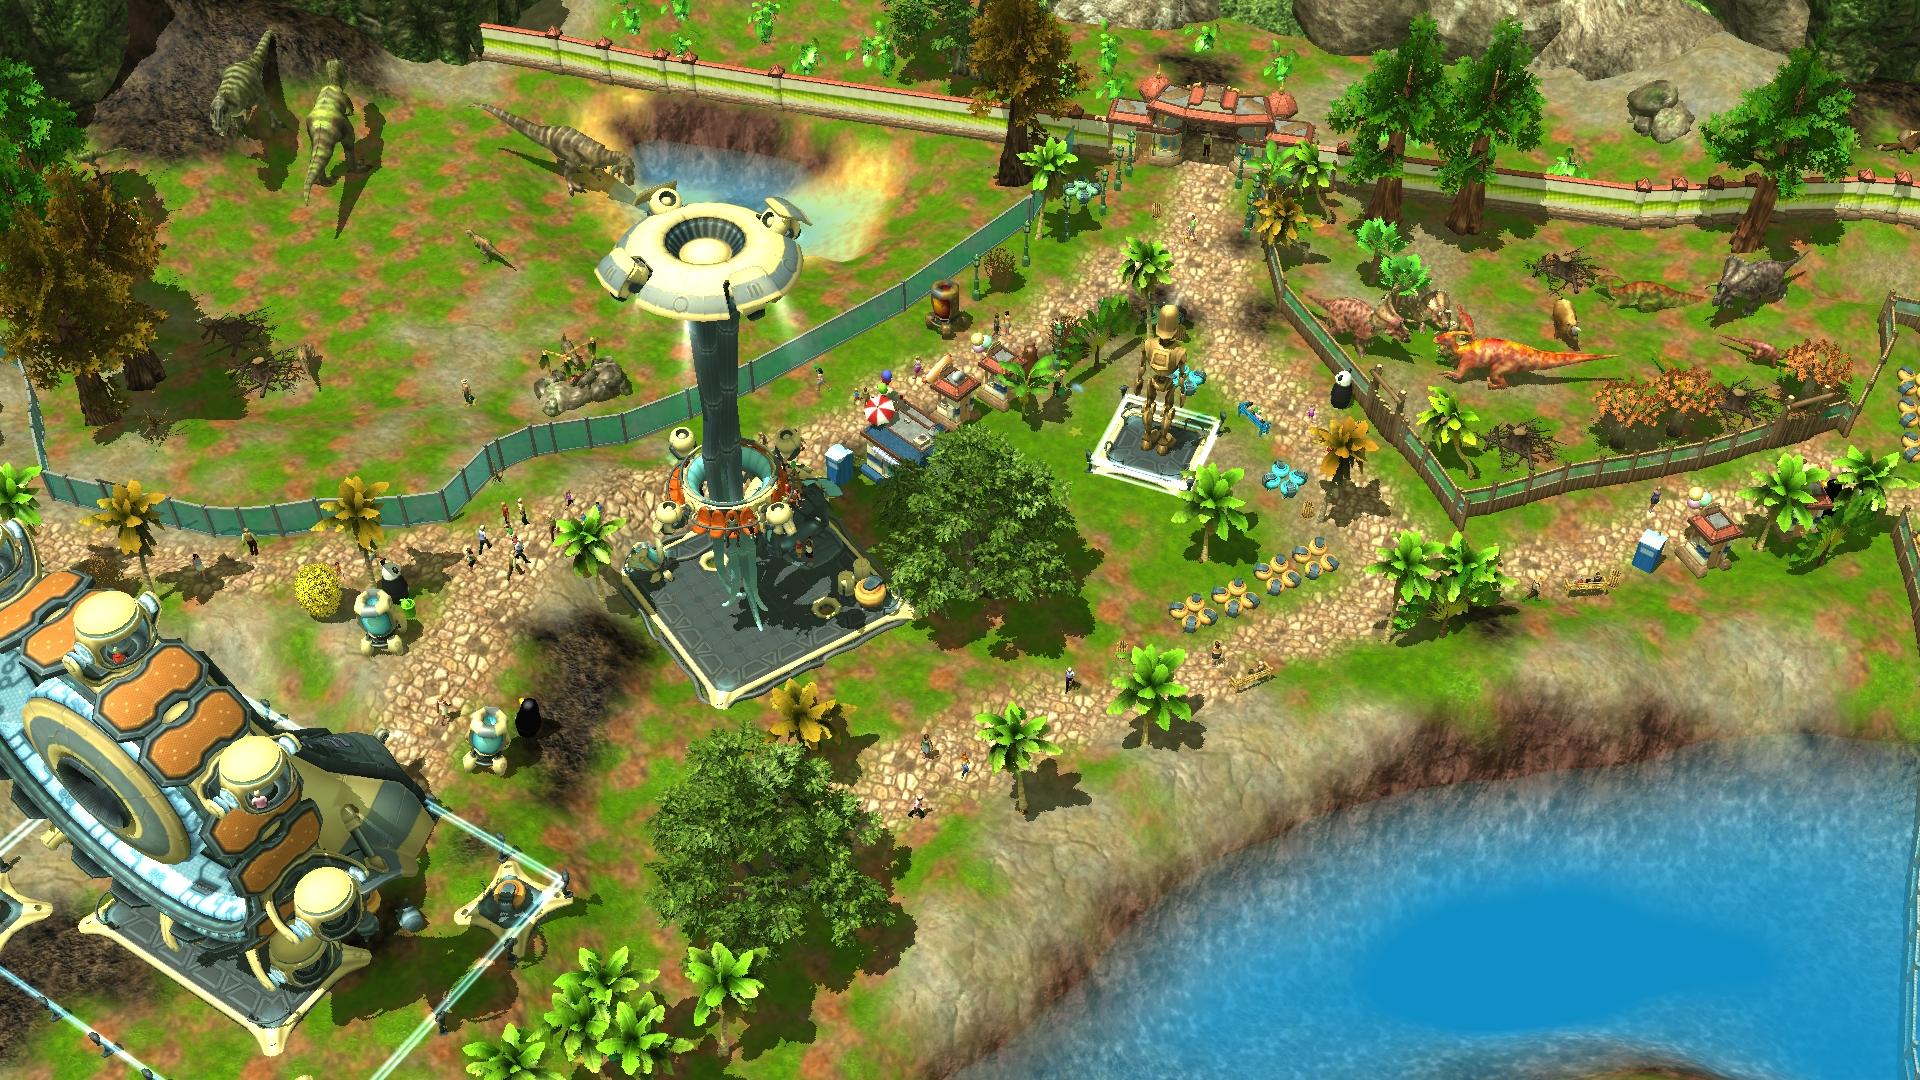 wildlife park 3 dino invasion download free full games strategy games. Black Bedroom Furniture Sets. Home Design Ideas